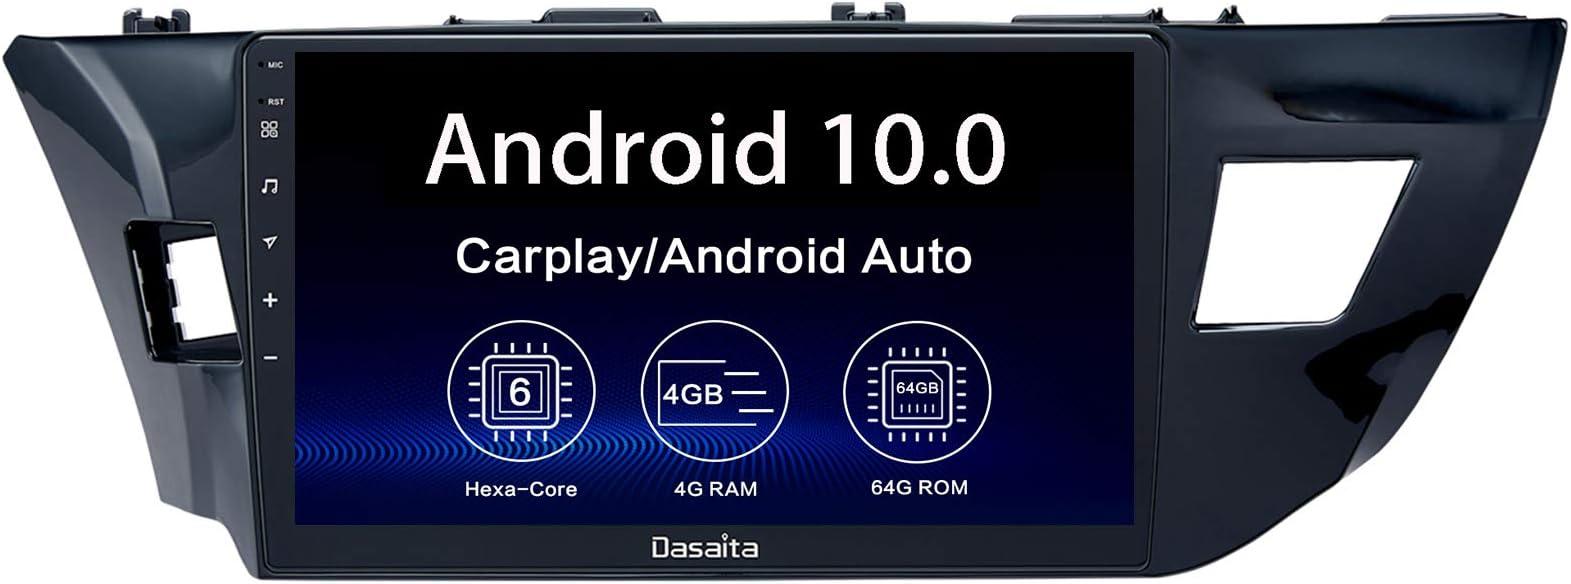 "Dasaita 10.2"" Android 10 Radio for Toyota Corolla 2014 2015 2016 bluetooth Stereo GPS Navigation PX6 DSP Android Auto Head Unit Wireless Carplay 1280 x 720 HD"